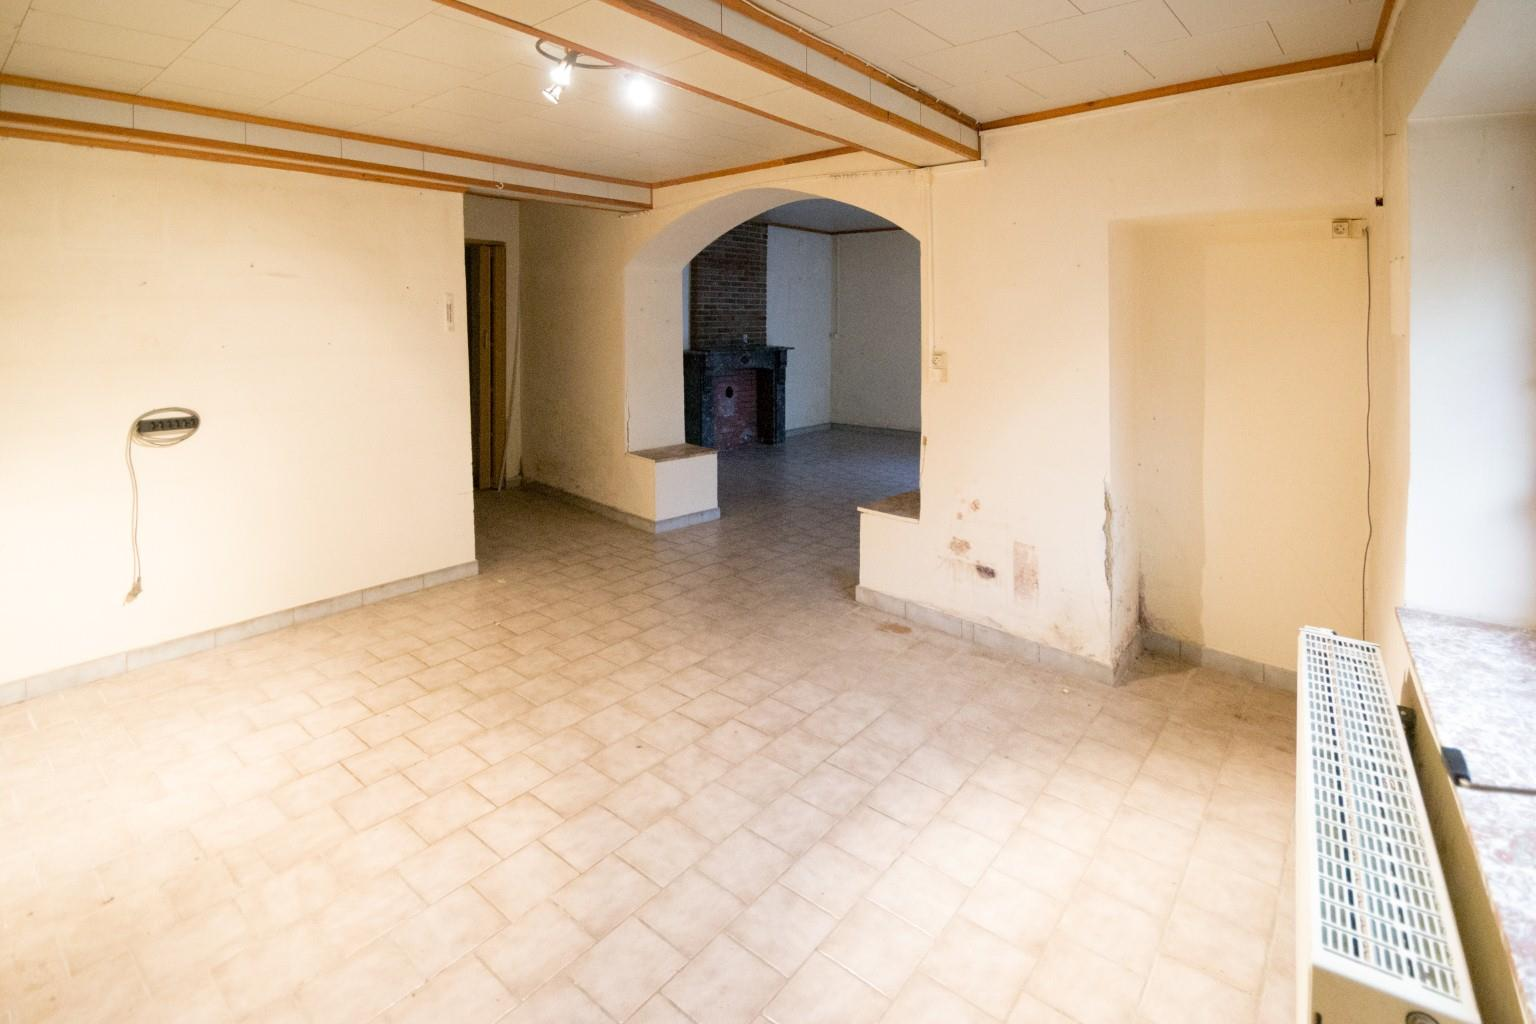 Maison - Lobbes - #2285567-1